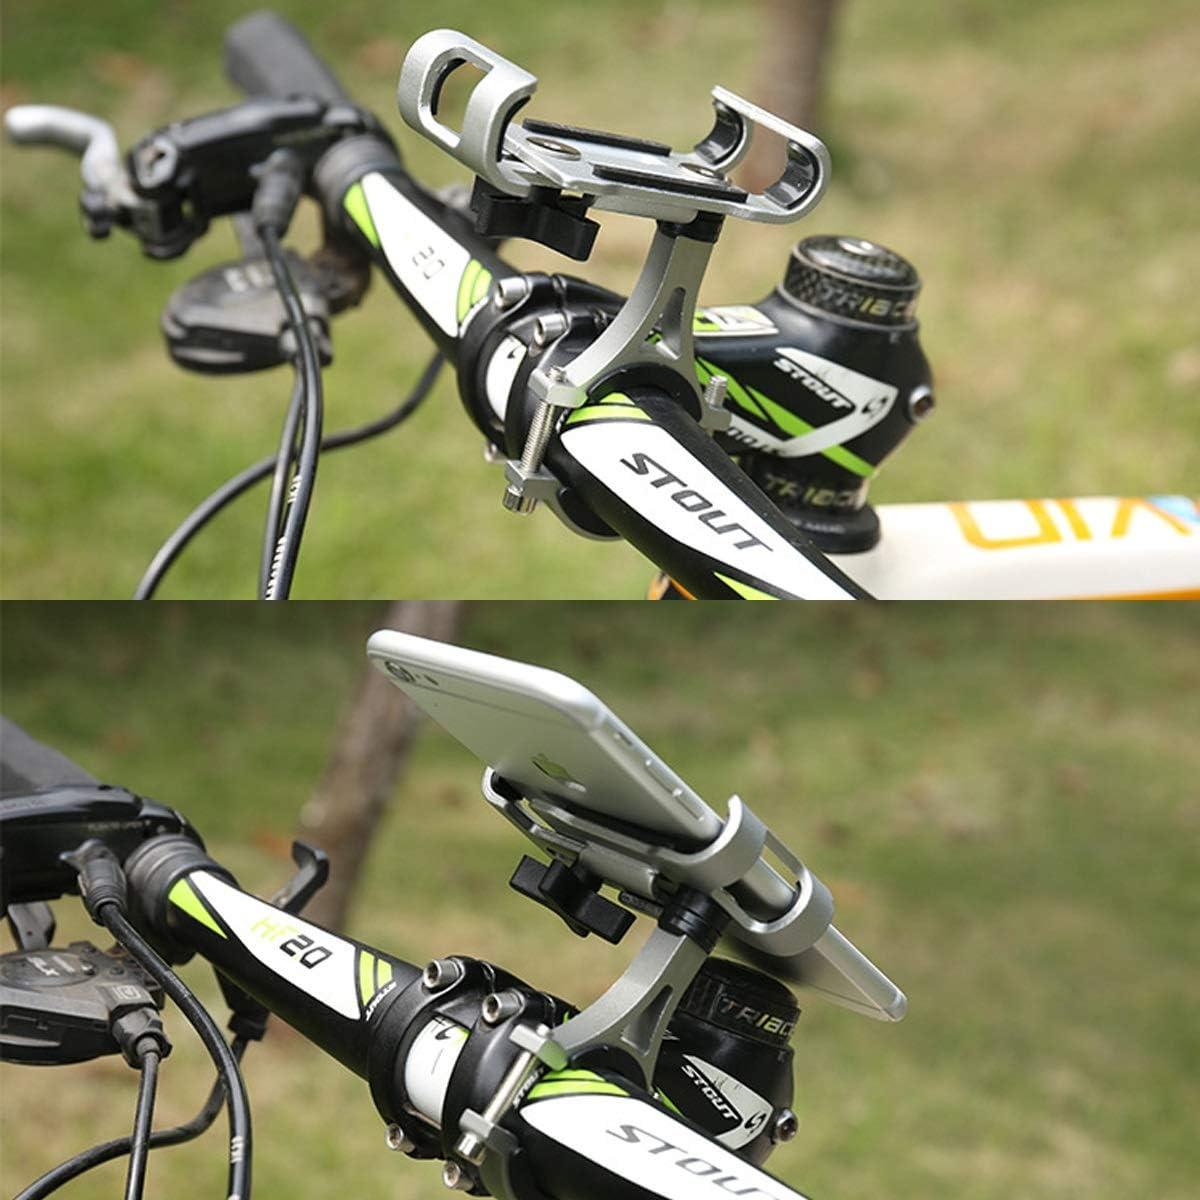 DEALPEAK Aluminum Motorcycle Bike Bicycle Holder Mount MTB Handlebar for Cell Phone GPS Color : Black